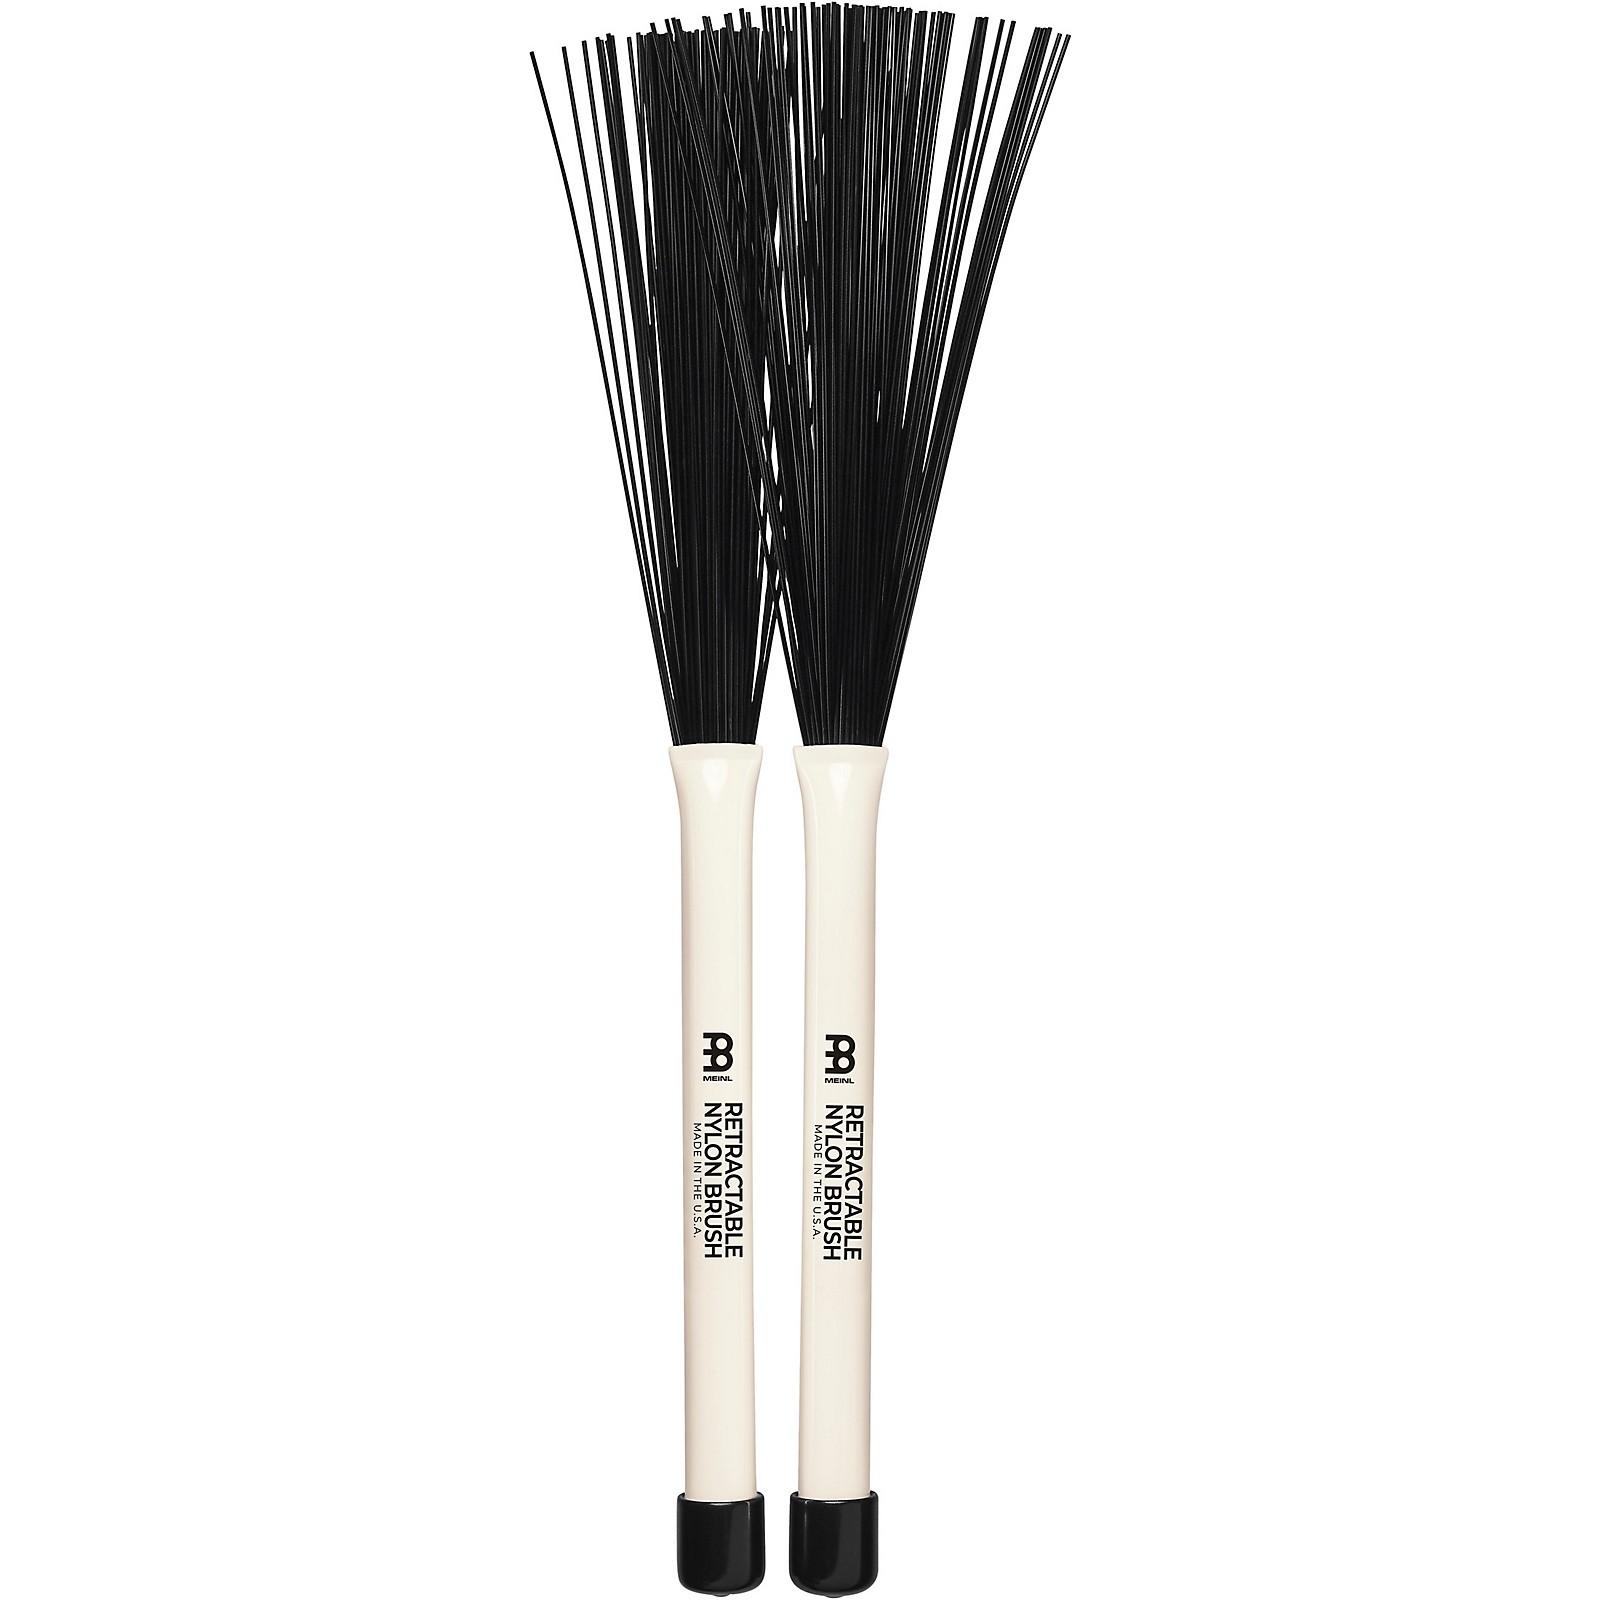 Meinl Stick & Brush Retractable Nylon Brushes